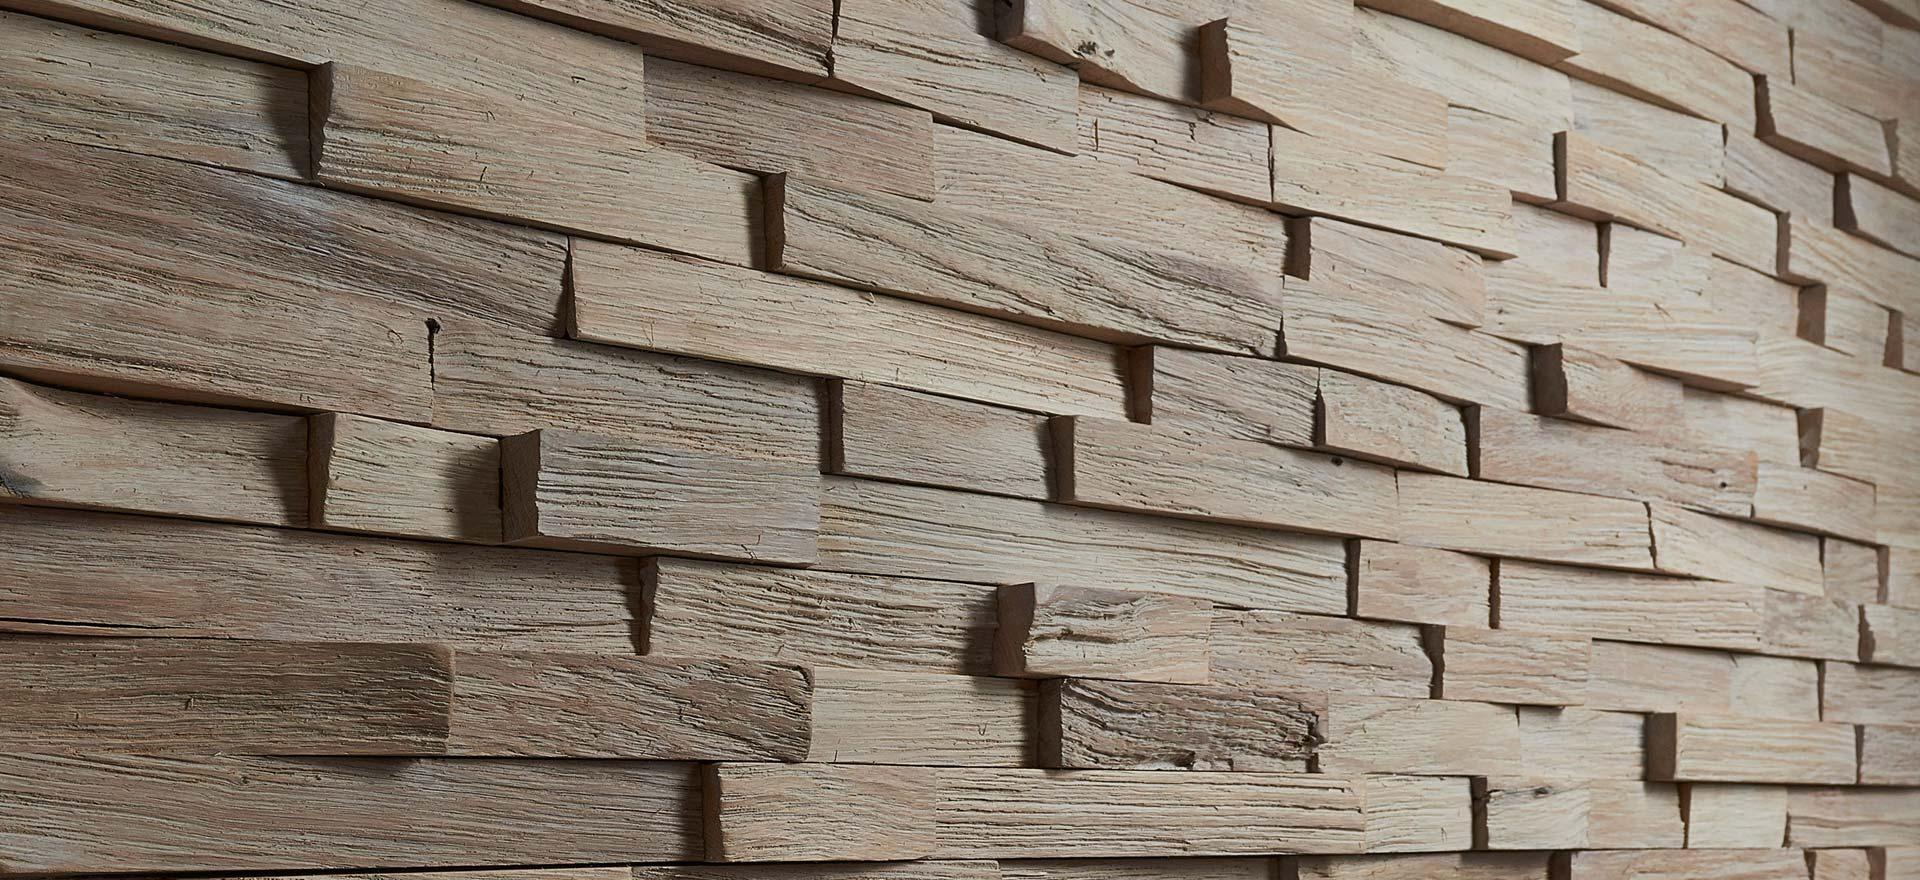 Holz Waidelich Waldenbuch wandpaneele altholz wandgestaltung holz waidelich